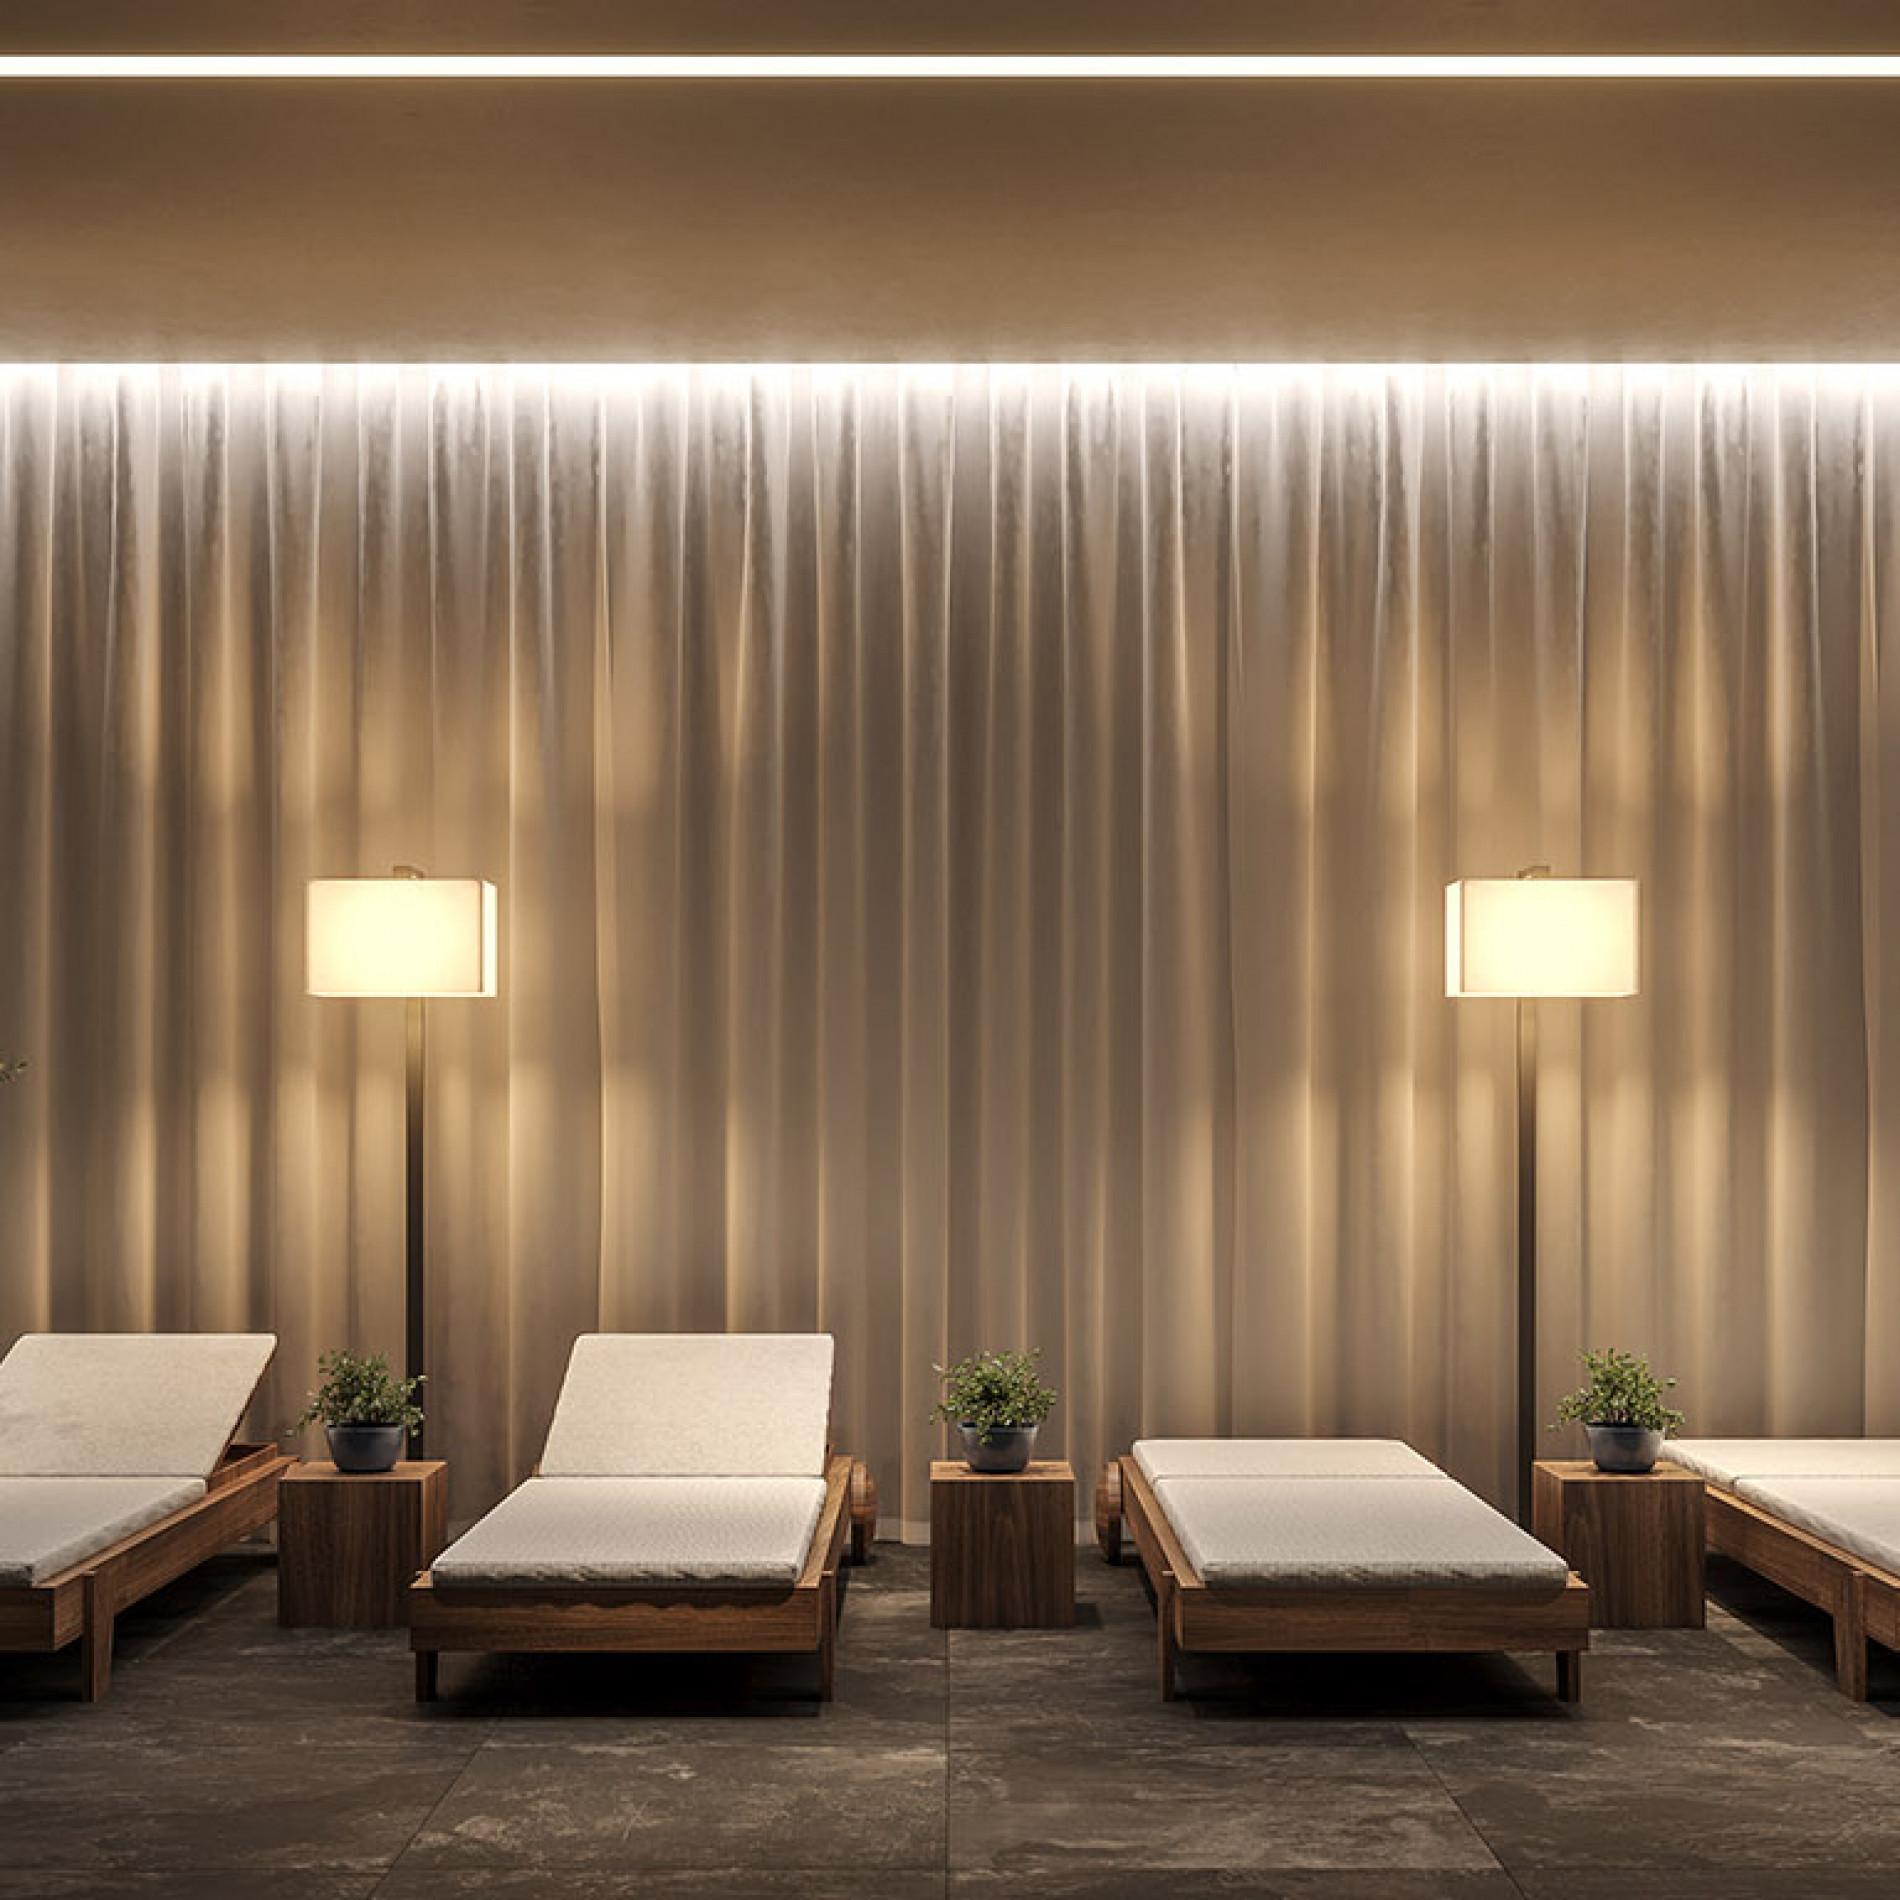 embla-13-saunas-descanso-high.jpg